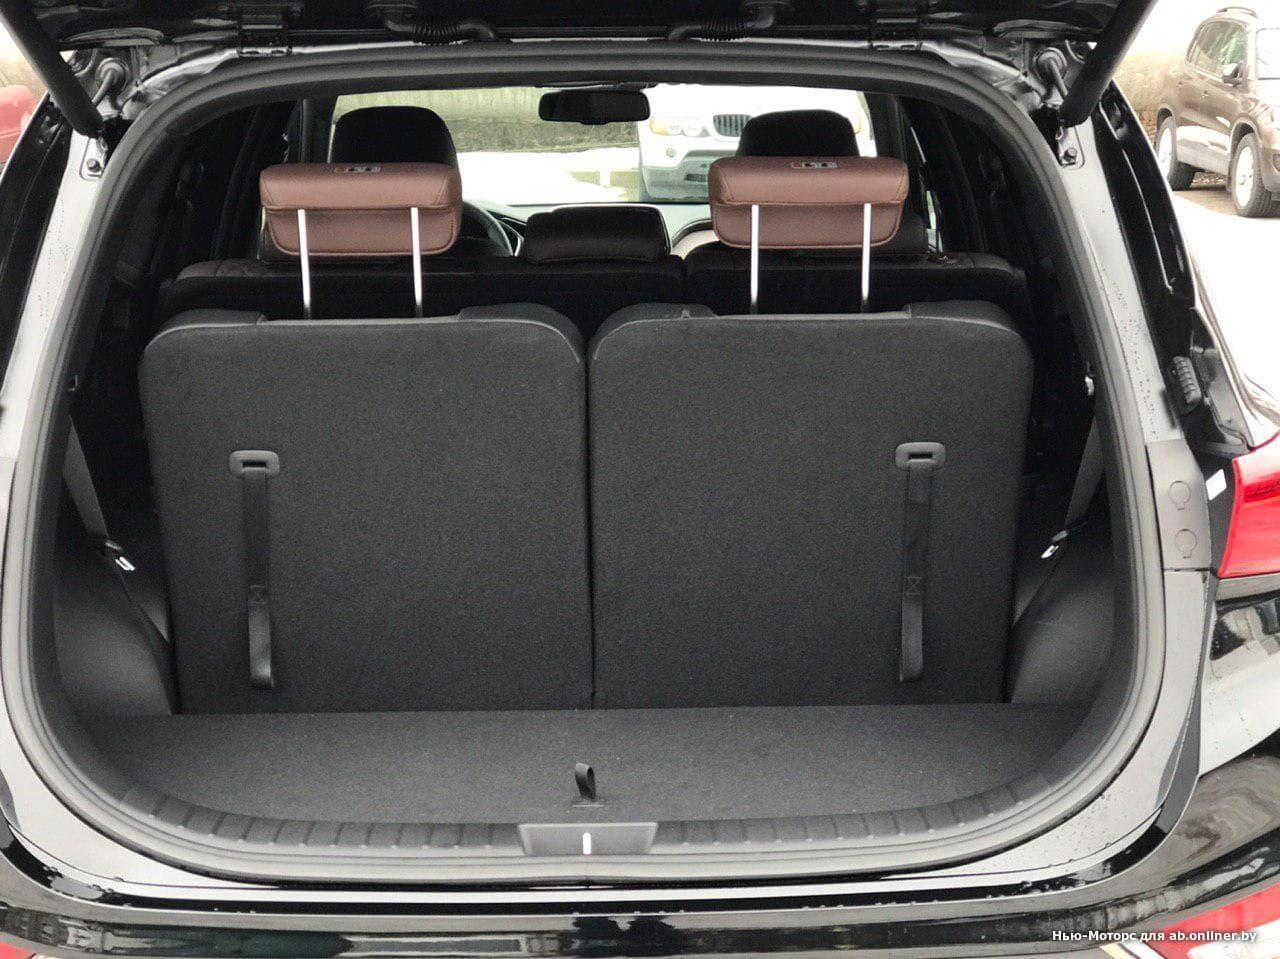 Hyundai Santa Fe Black and Brown